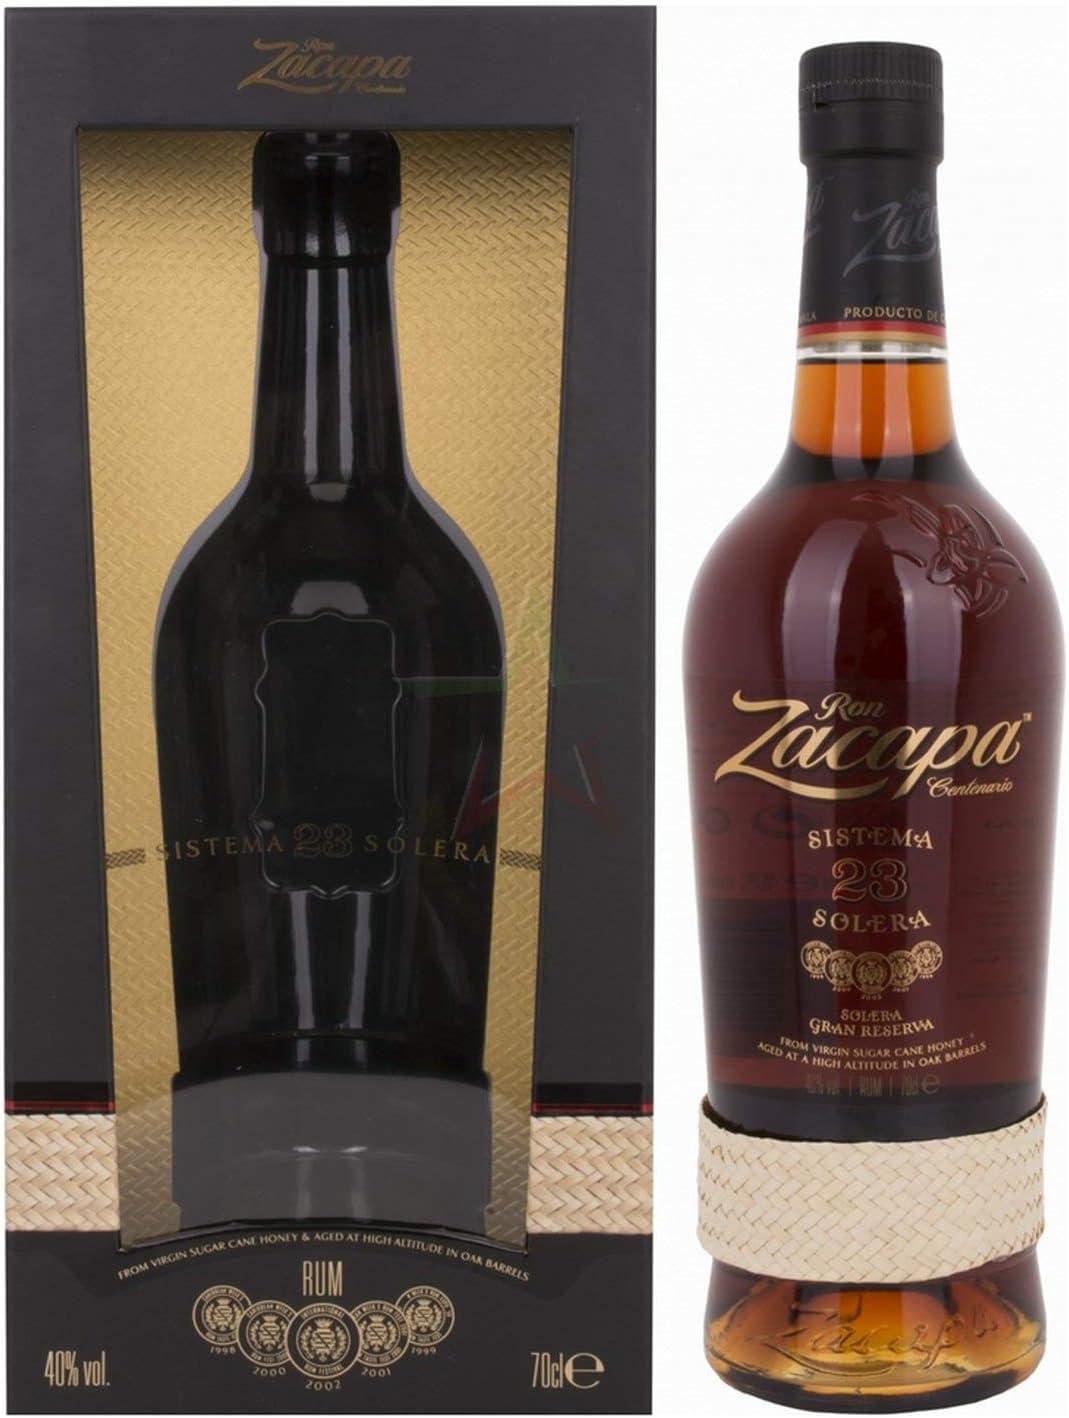 Ron Zacapa Limited Edition 23 Solera Gran Reserva Rum - 700 ml